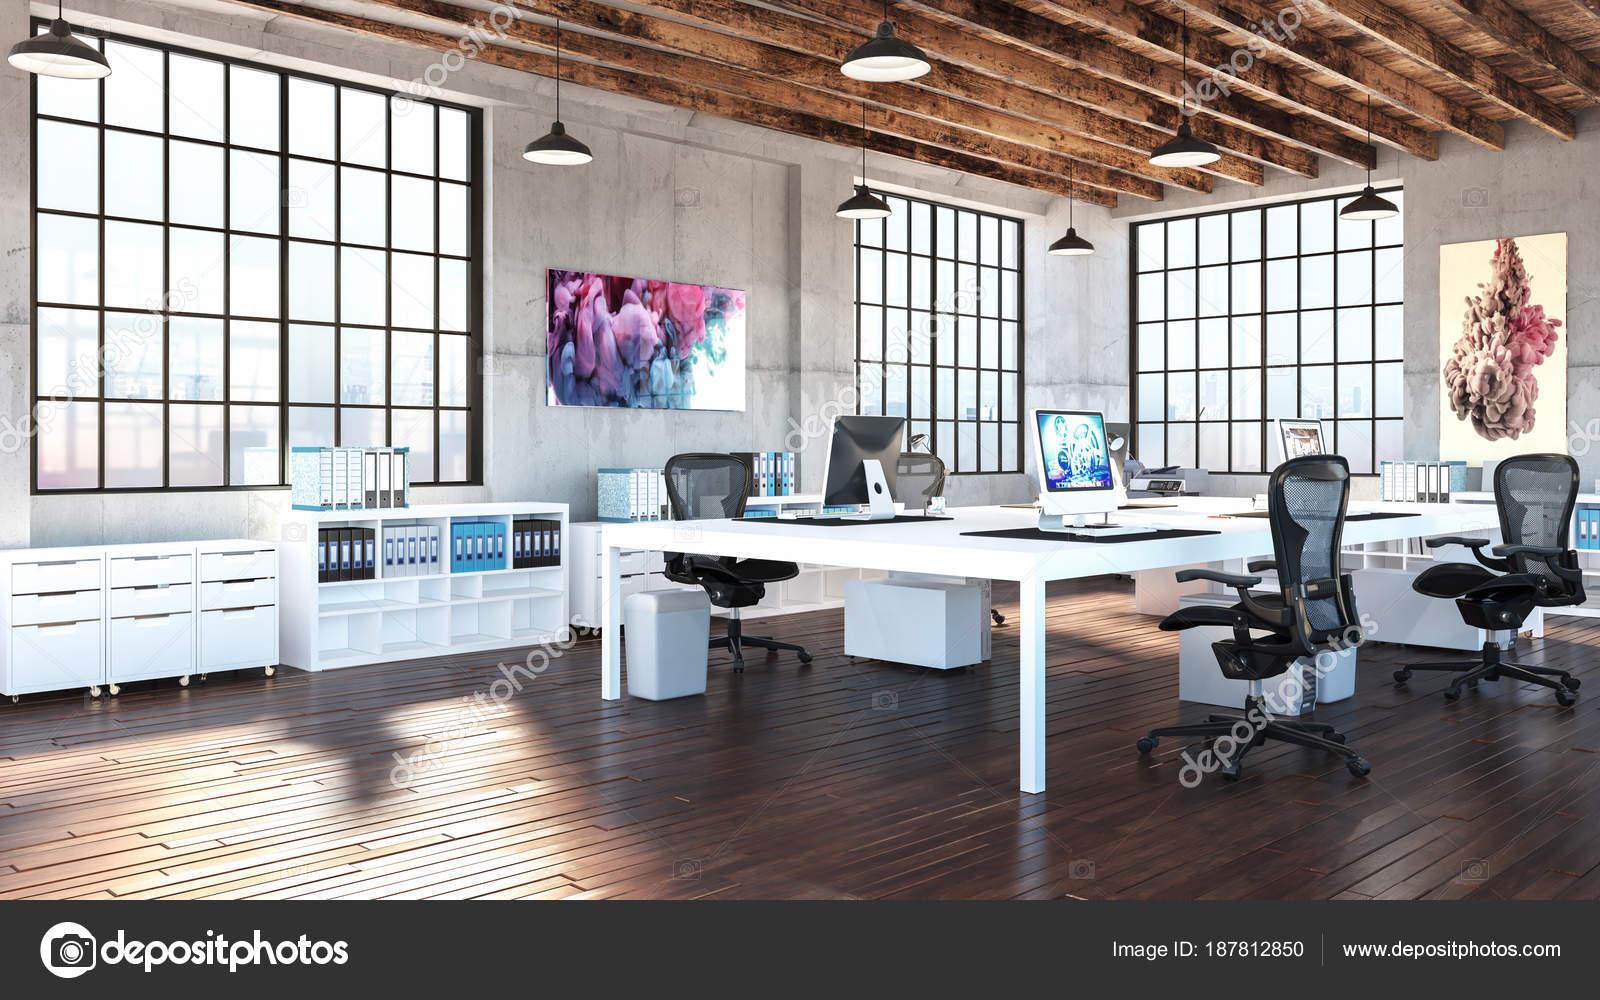 Bureau deco bricks bois design d intérieur amyscakesandmore id